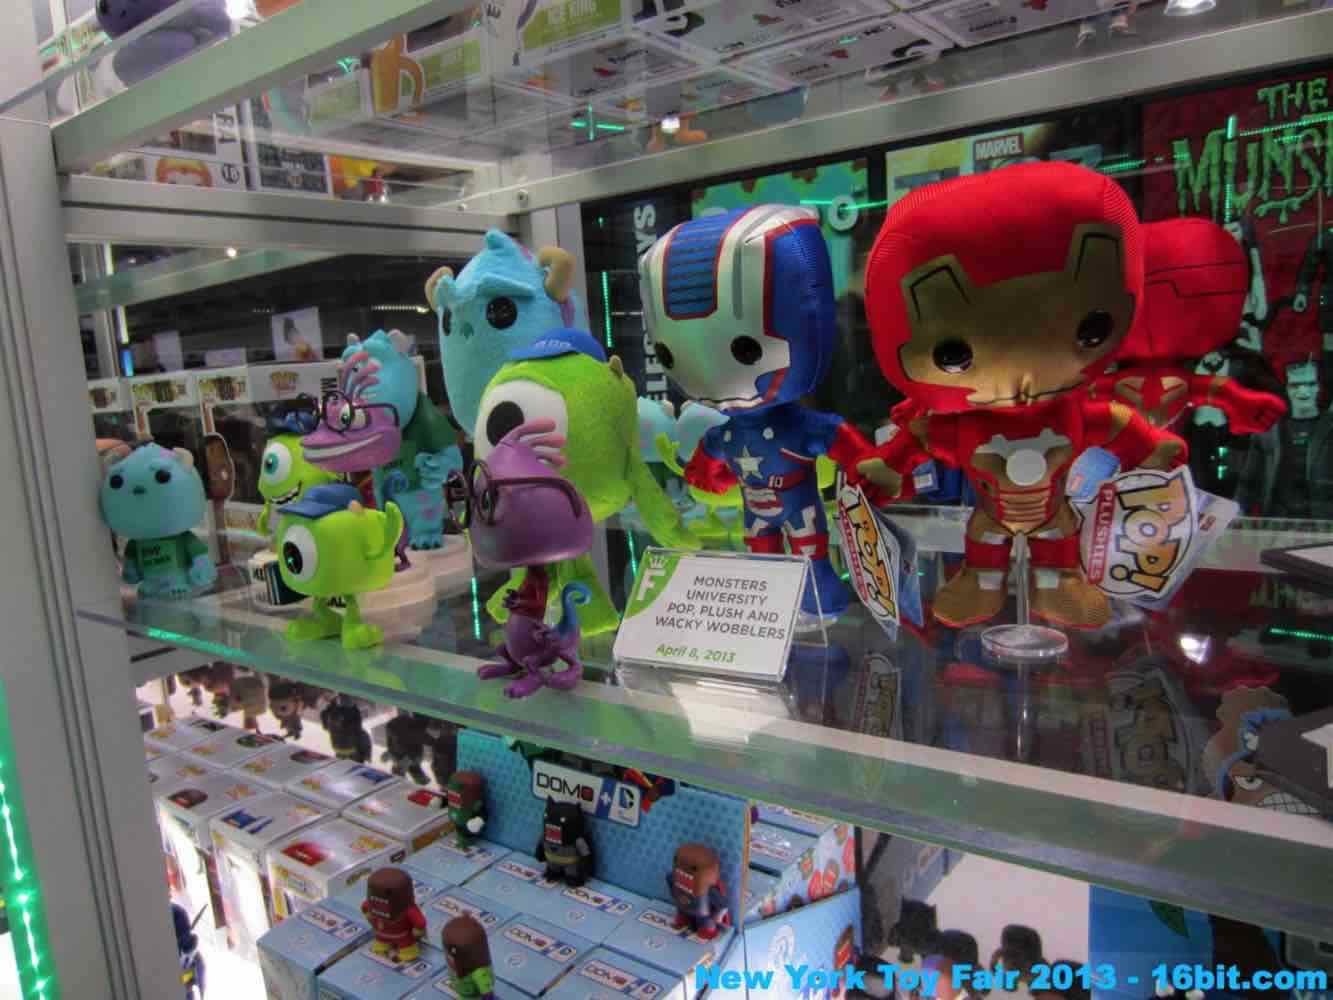 16bit Com Toy Fair Coverage Of Funko Vinyl Figures Toys